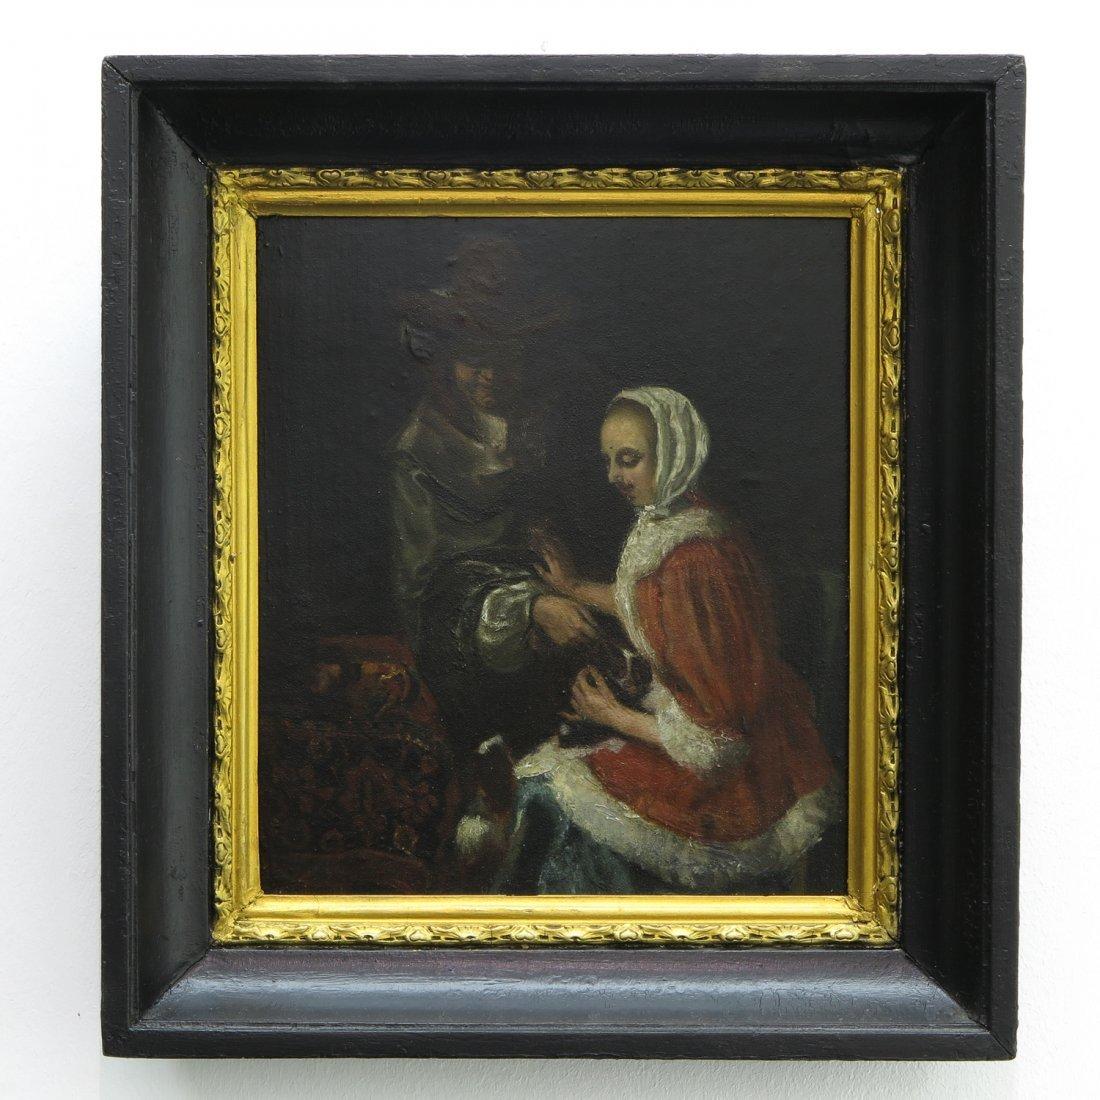 Oil on Panel Depicting Romantic Scene